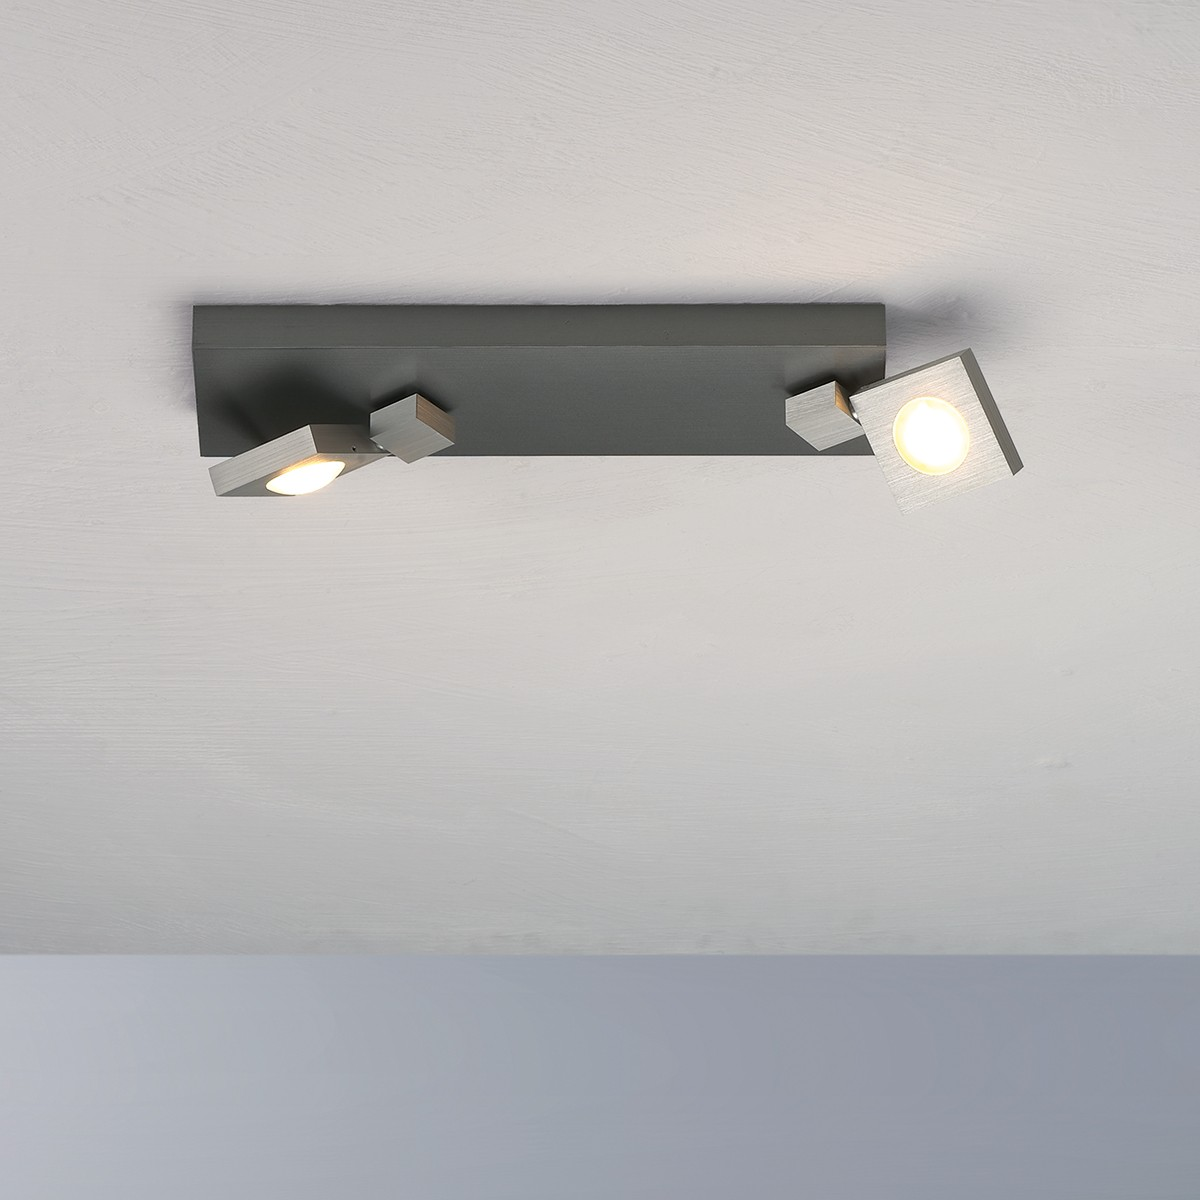 Bopp Flash LED Deckenleuchte 2-flg., Aluminium geschliffen - anthrazit lackiert